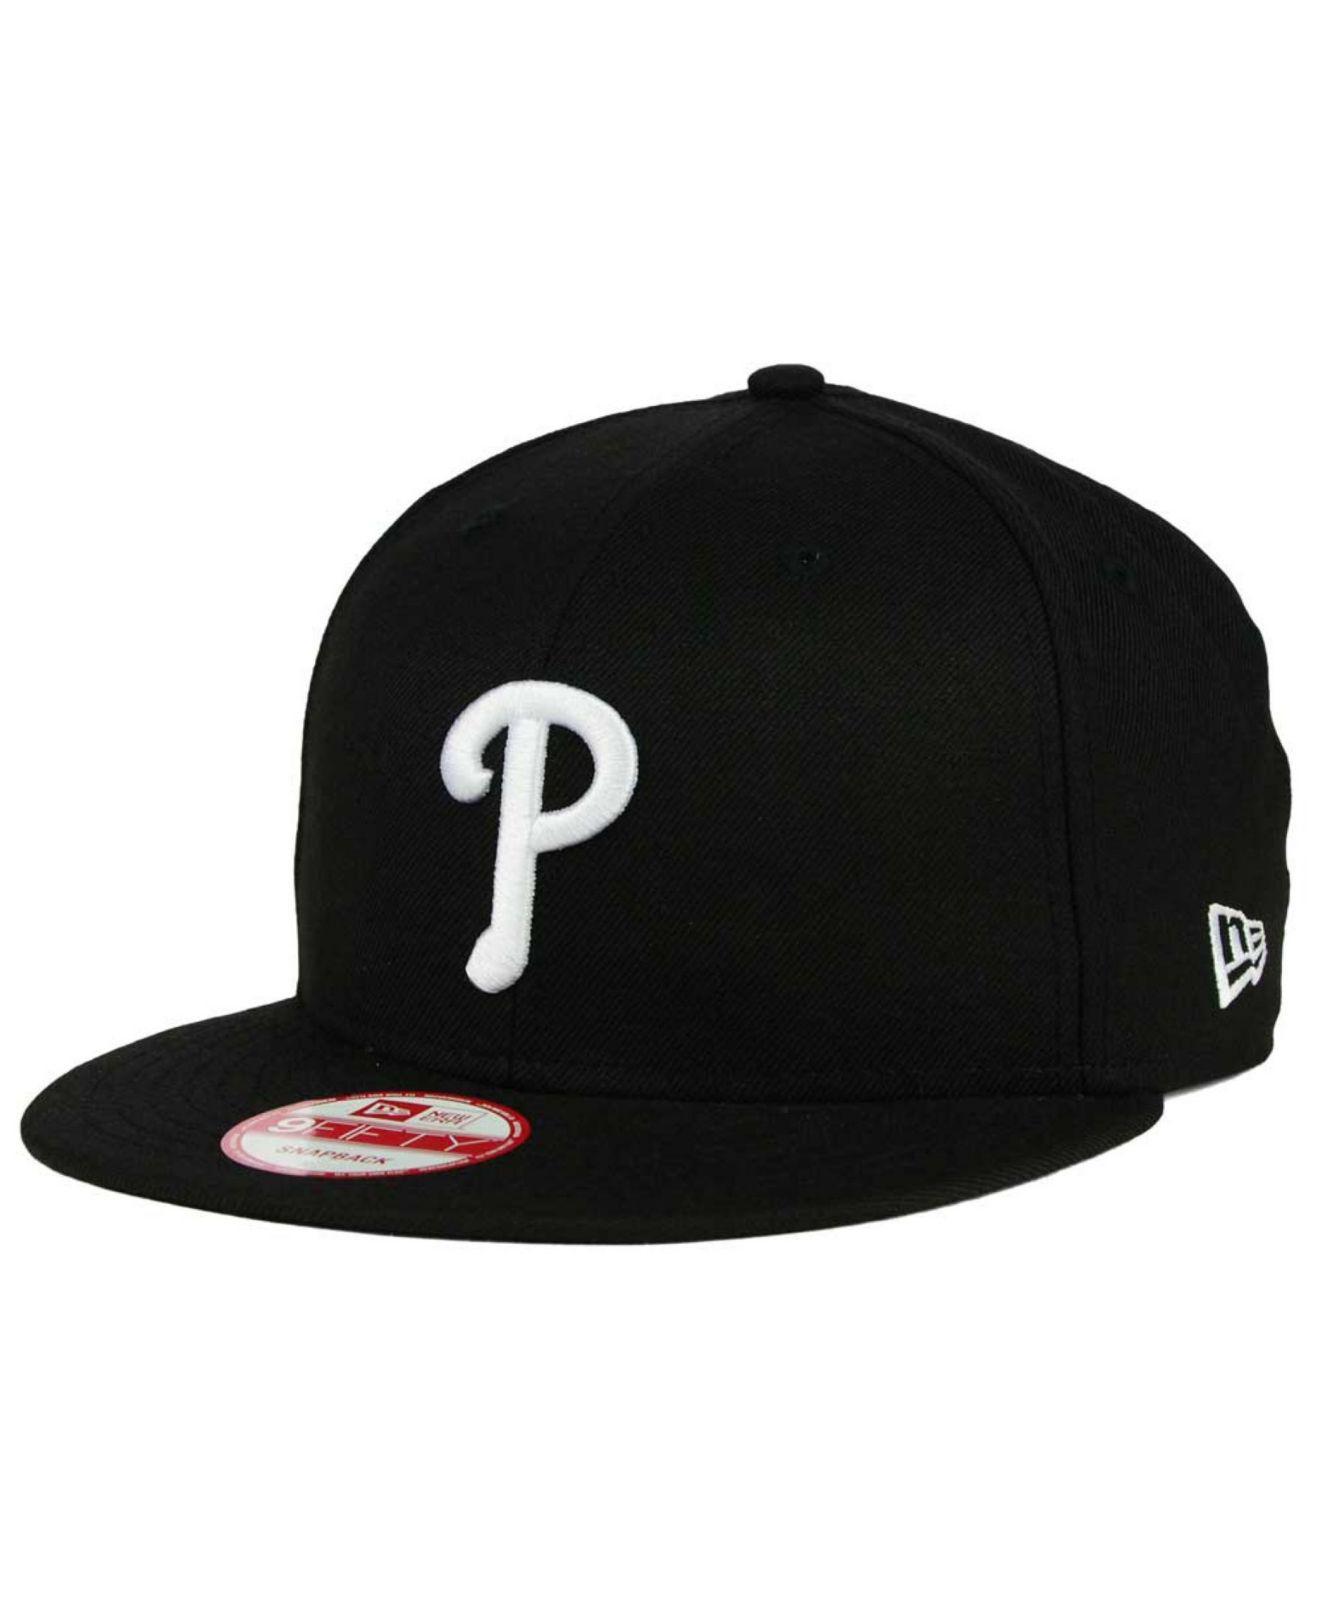 low priced c8256 f4dd6 get mens philadelphia new era gray black fitted hat 2415c 2d111  authentic  ktz. mens black philadelphia phillies b dub 9fifty snapback cap 27124 b5dbb